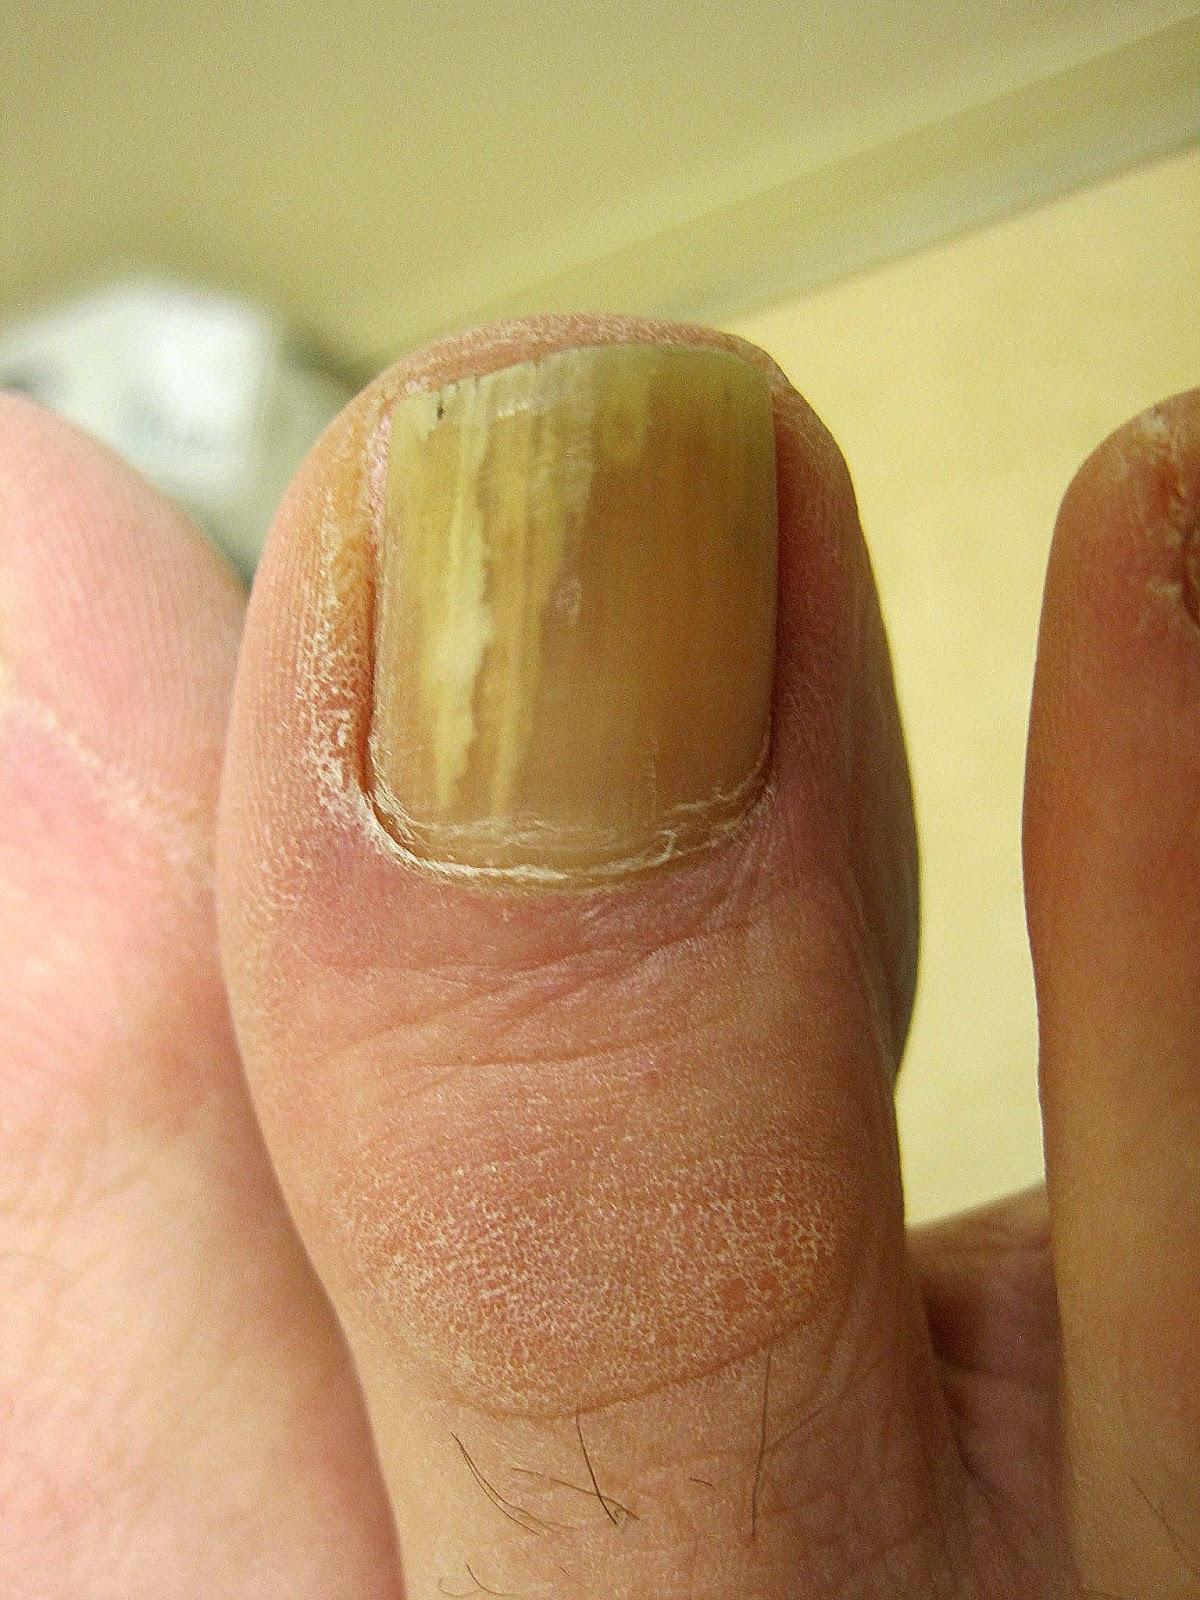 Why is my toenail yellow? | Louisiana Podiatrist - Gulf South Foot ...